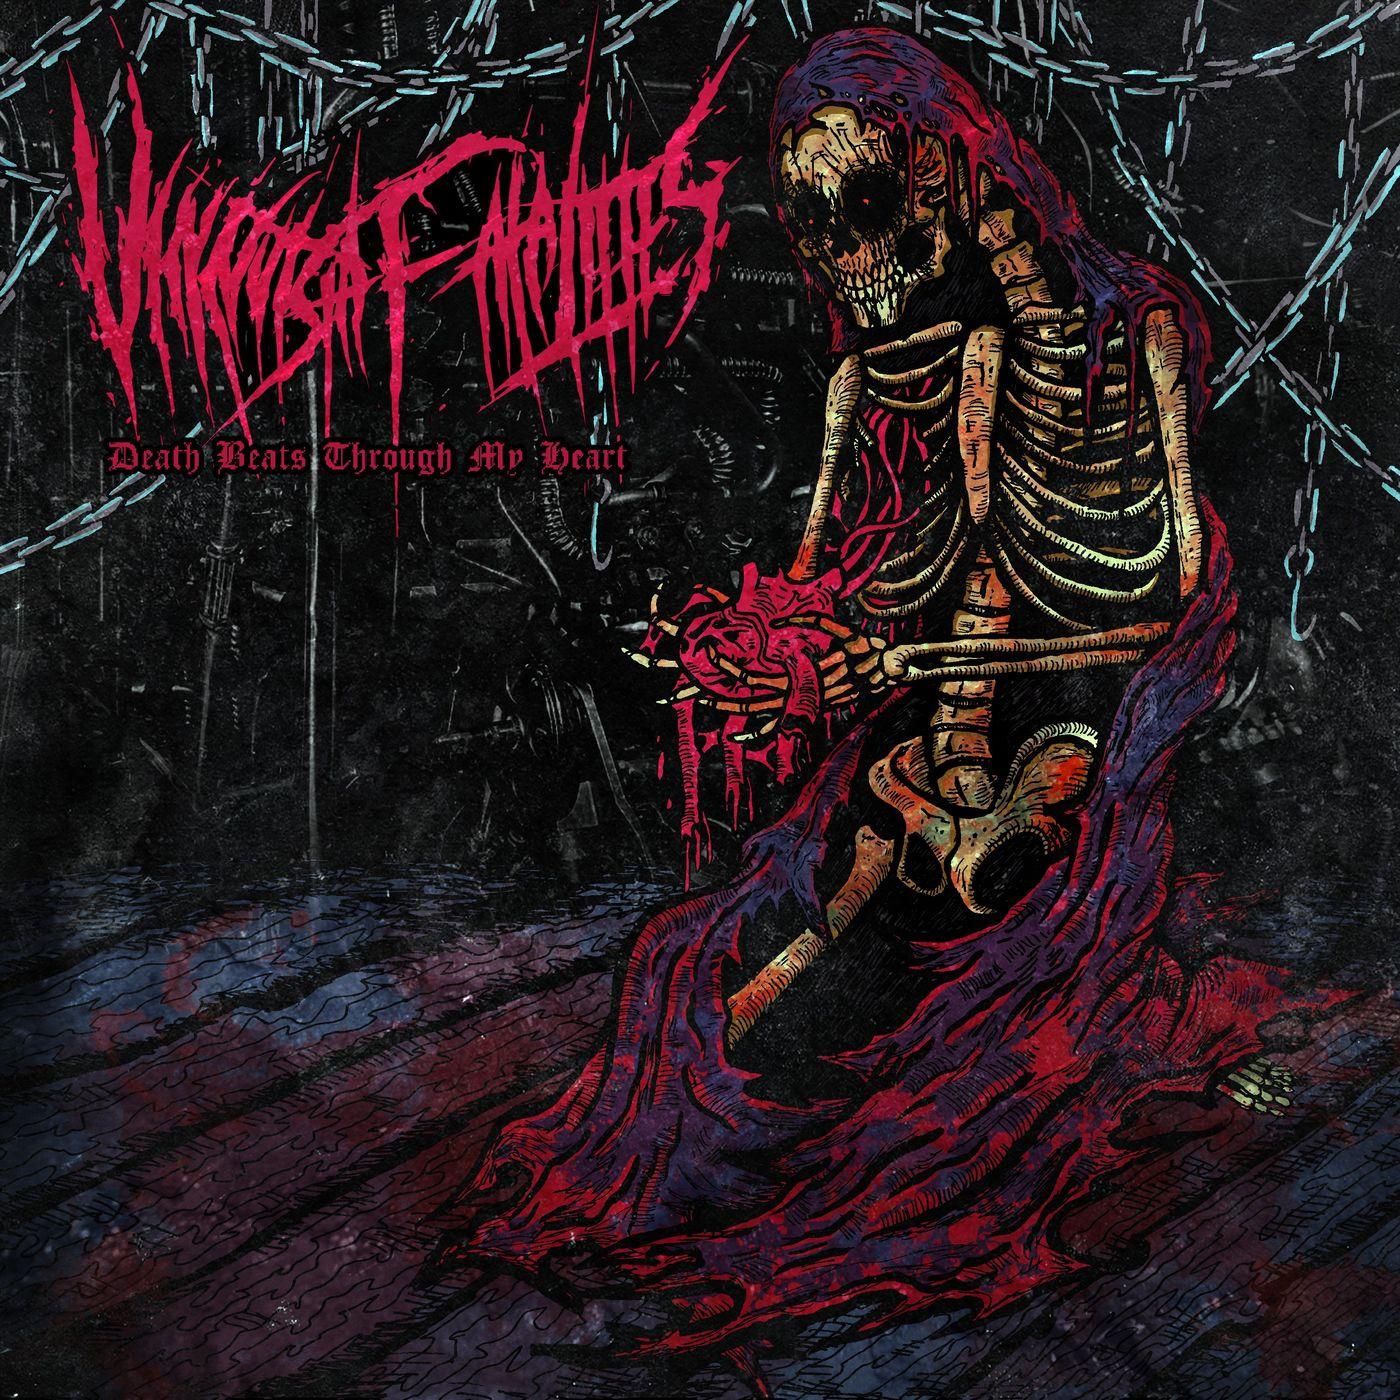 Vinnytsia Fatalities - Death Beats Through My Heart [EP] (2020)